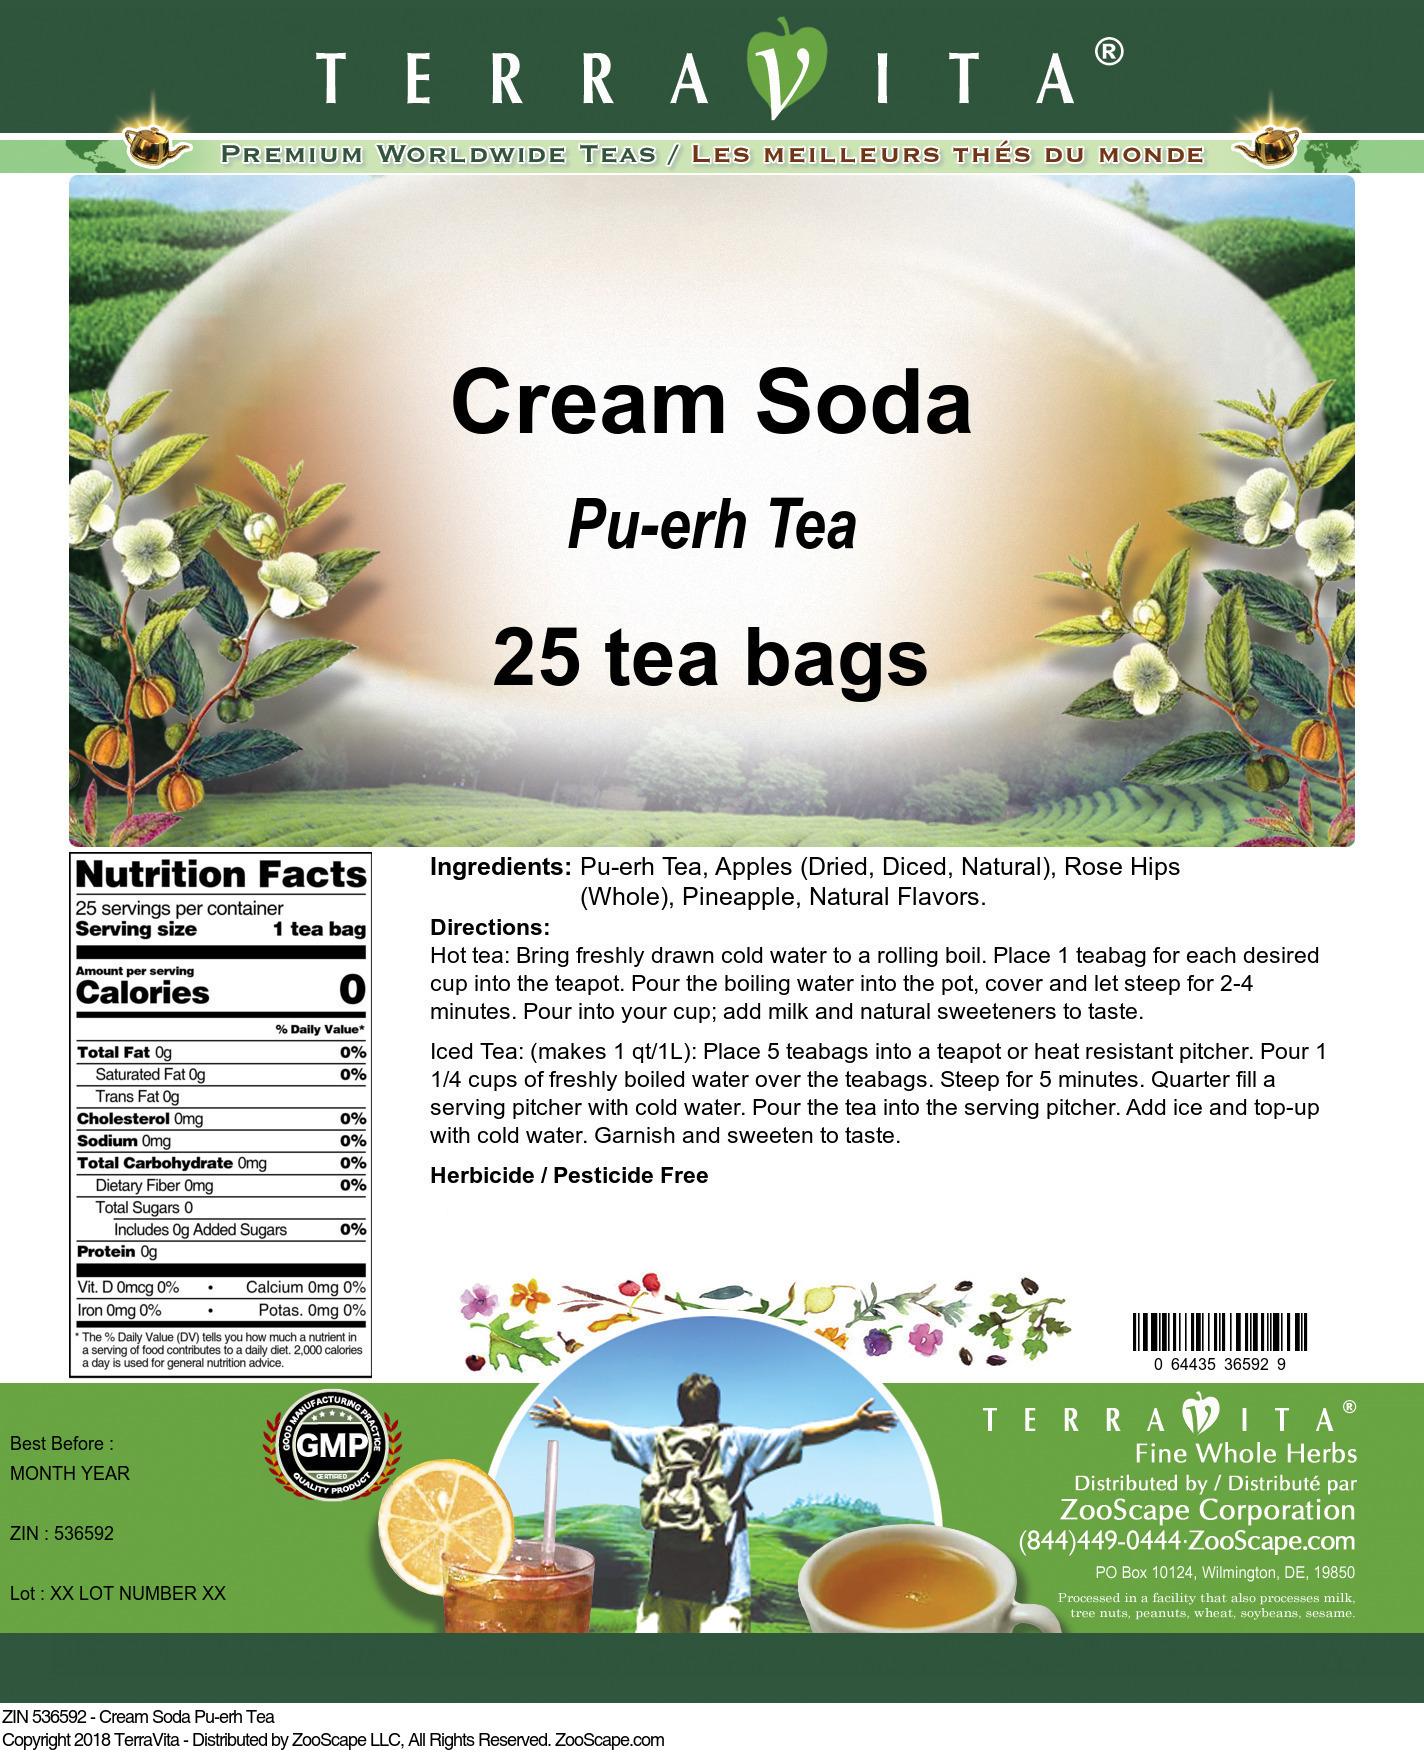 Cream Soda Pu-erh Tea